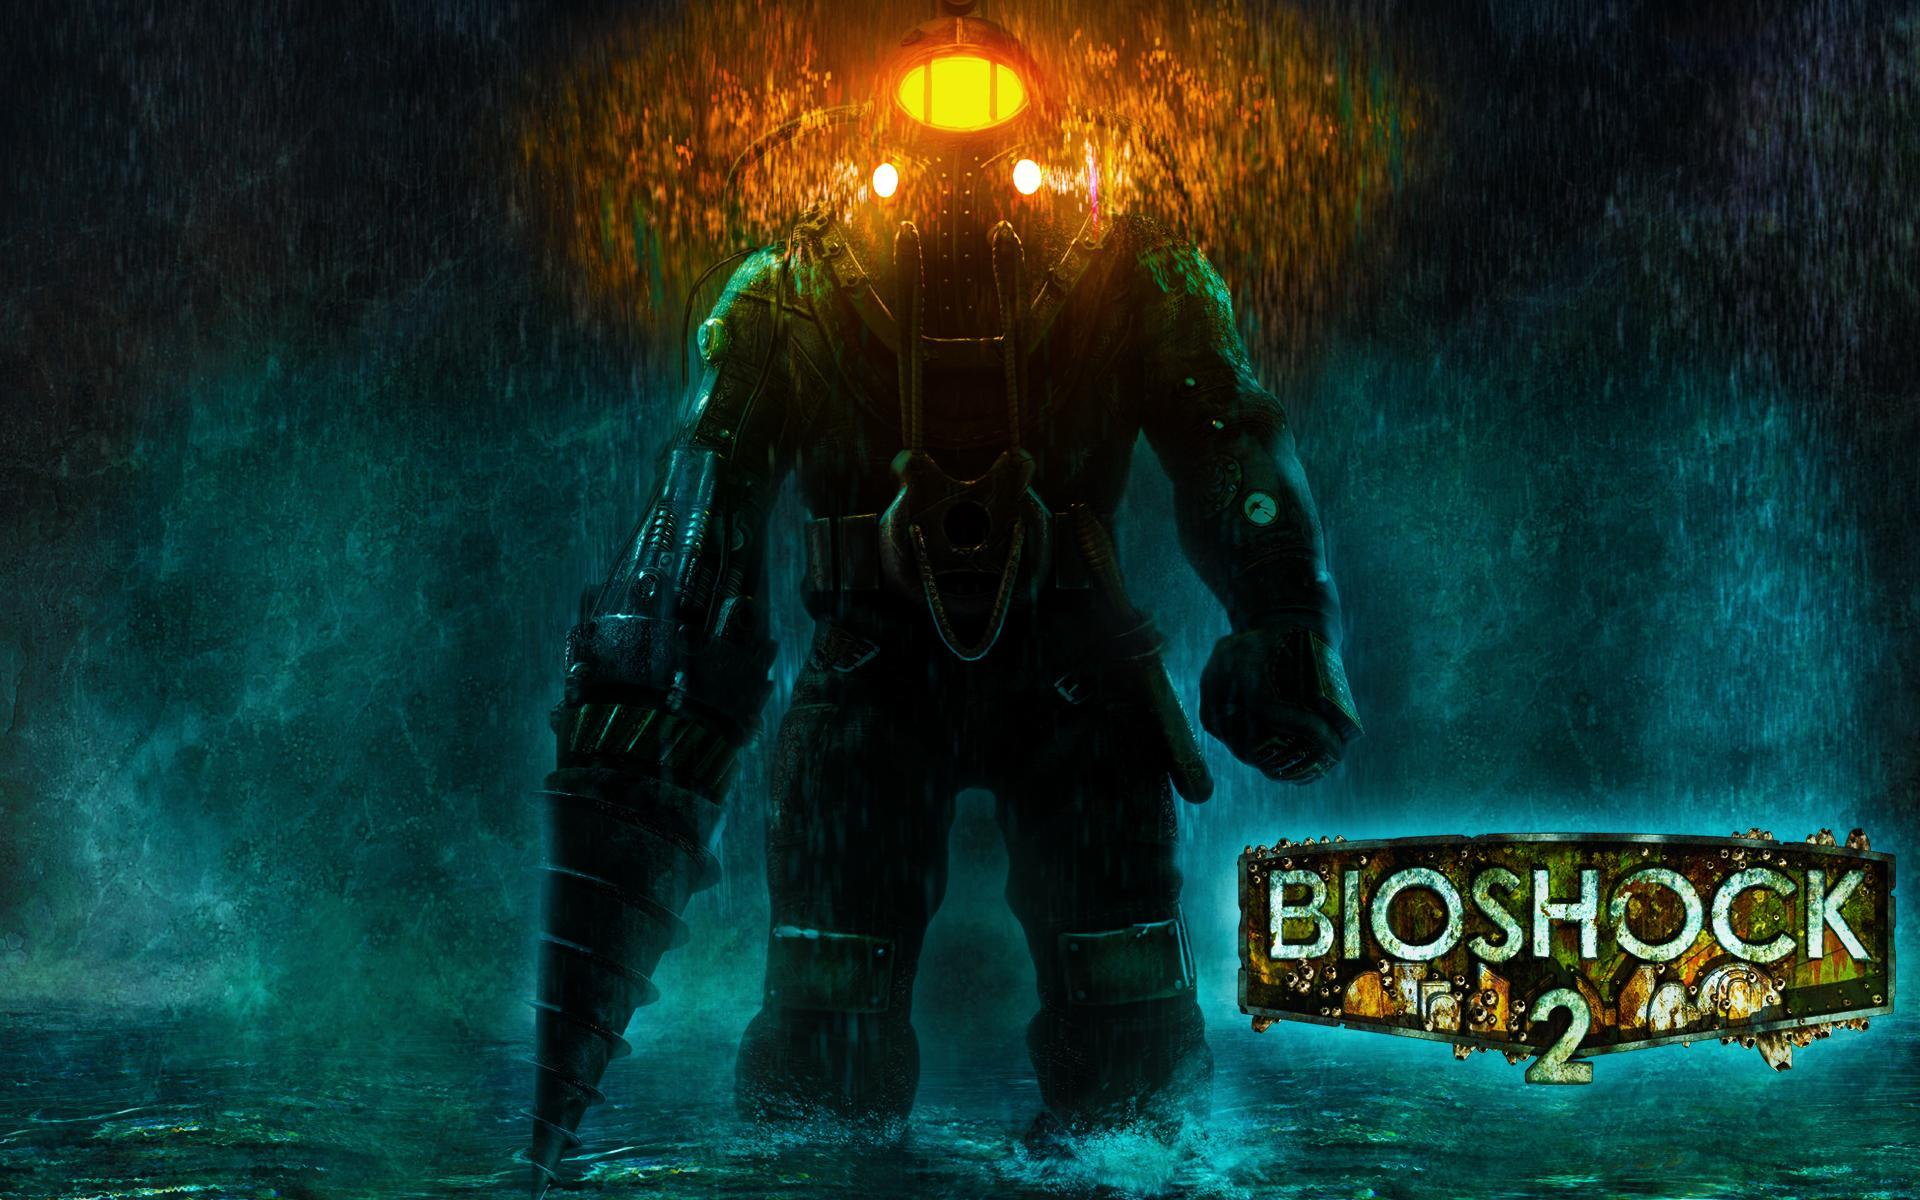 Epic Blue Car Wallpapers Bioshock 2 Revelation Hd Desktop Wallpaper Widescreen